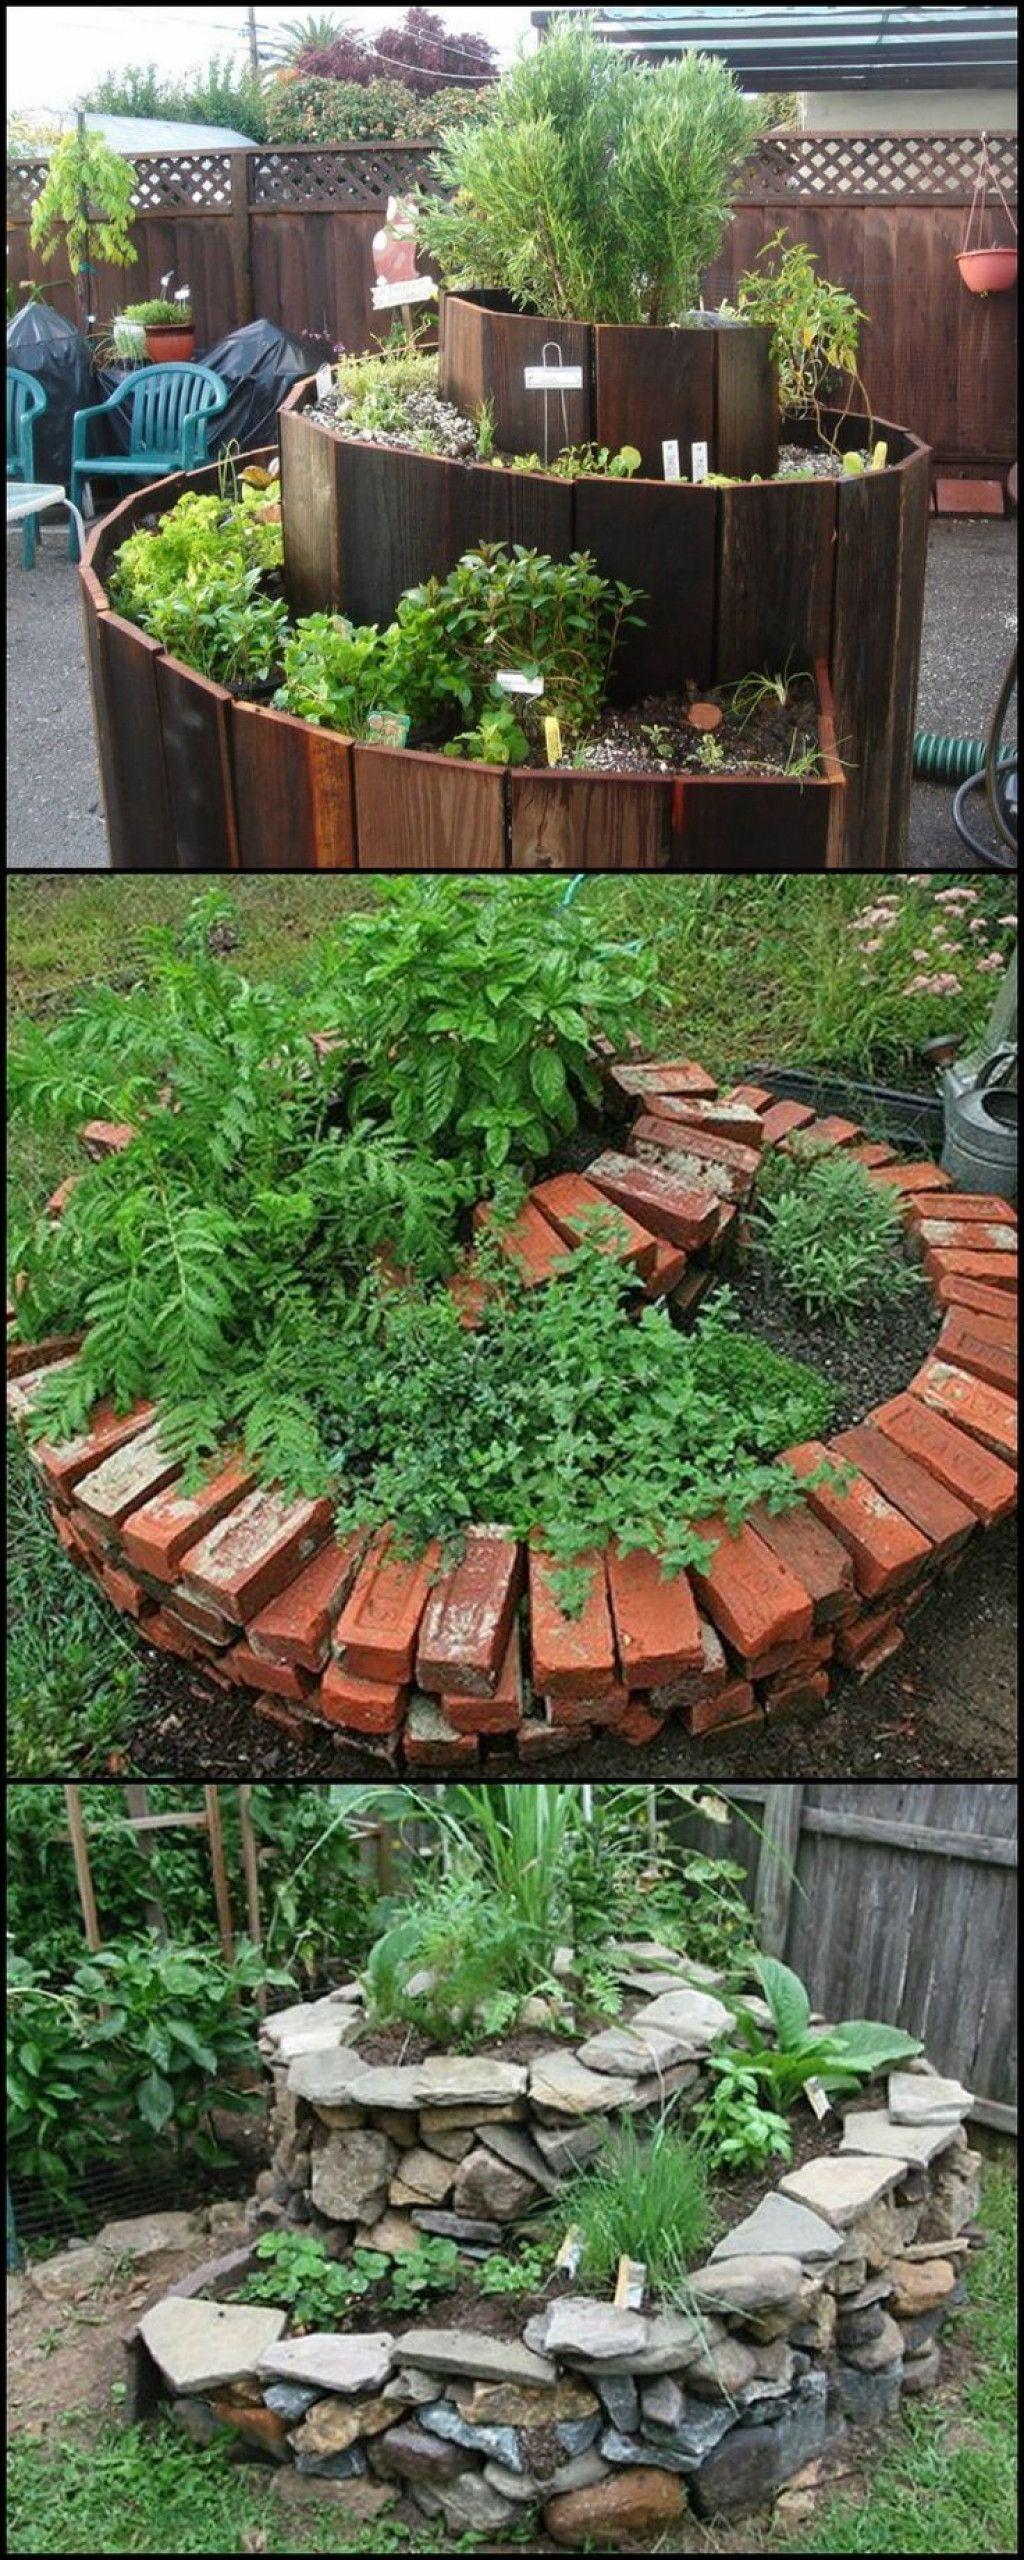 2b0a549b249c461de38a40fbea5d2b2d - What Type Plants Are Suitable For Micro Gardening